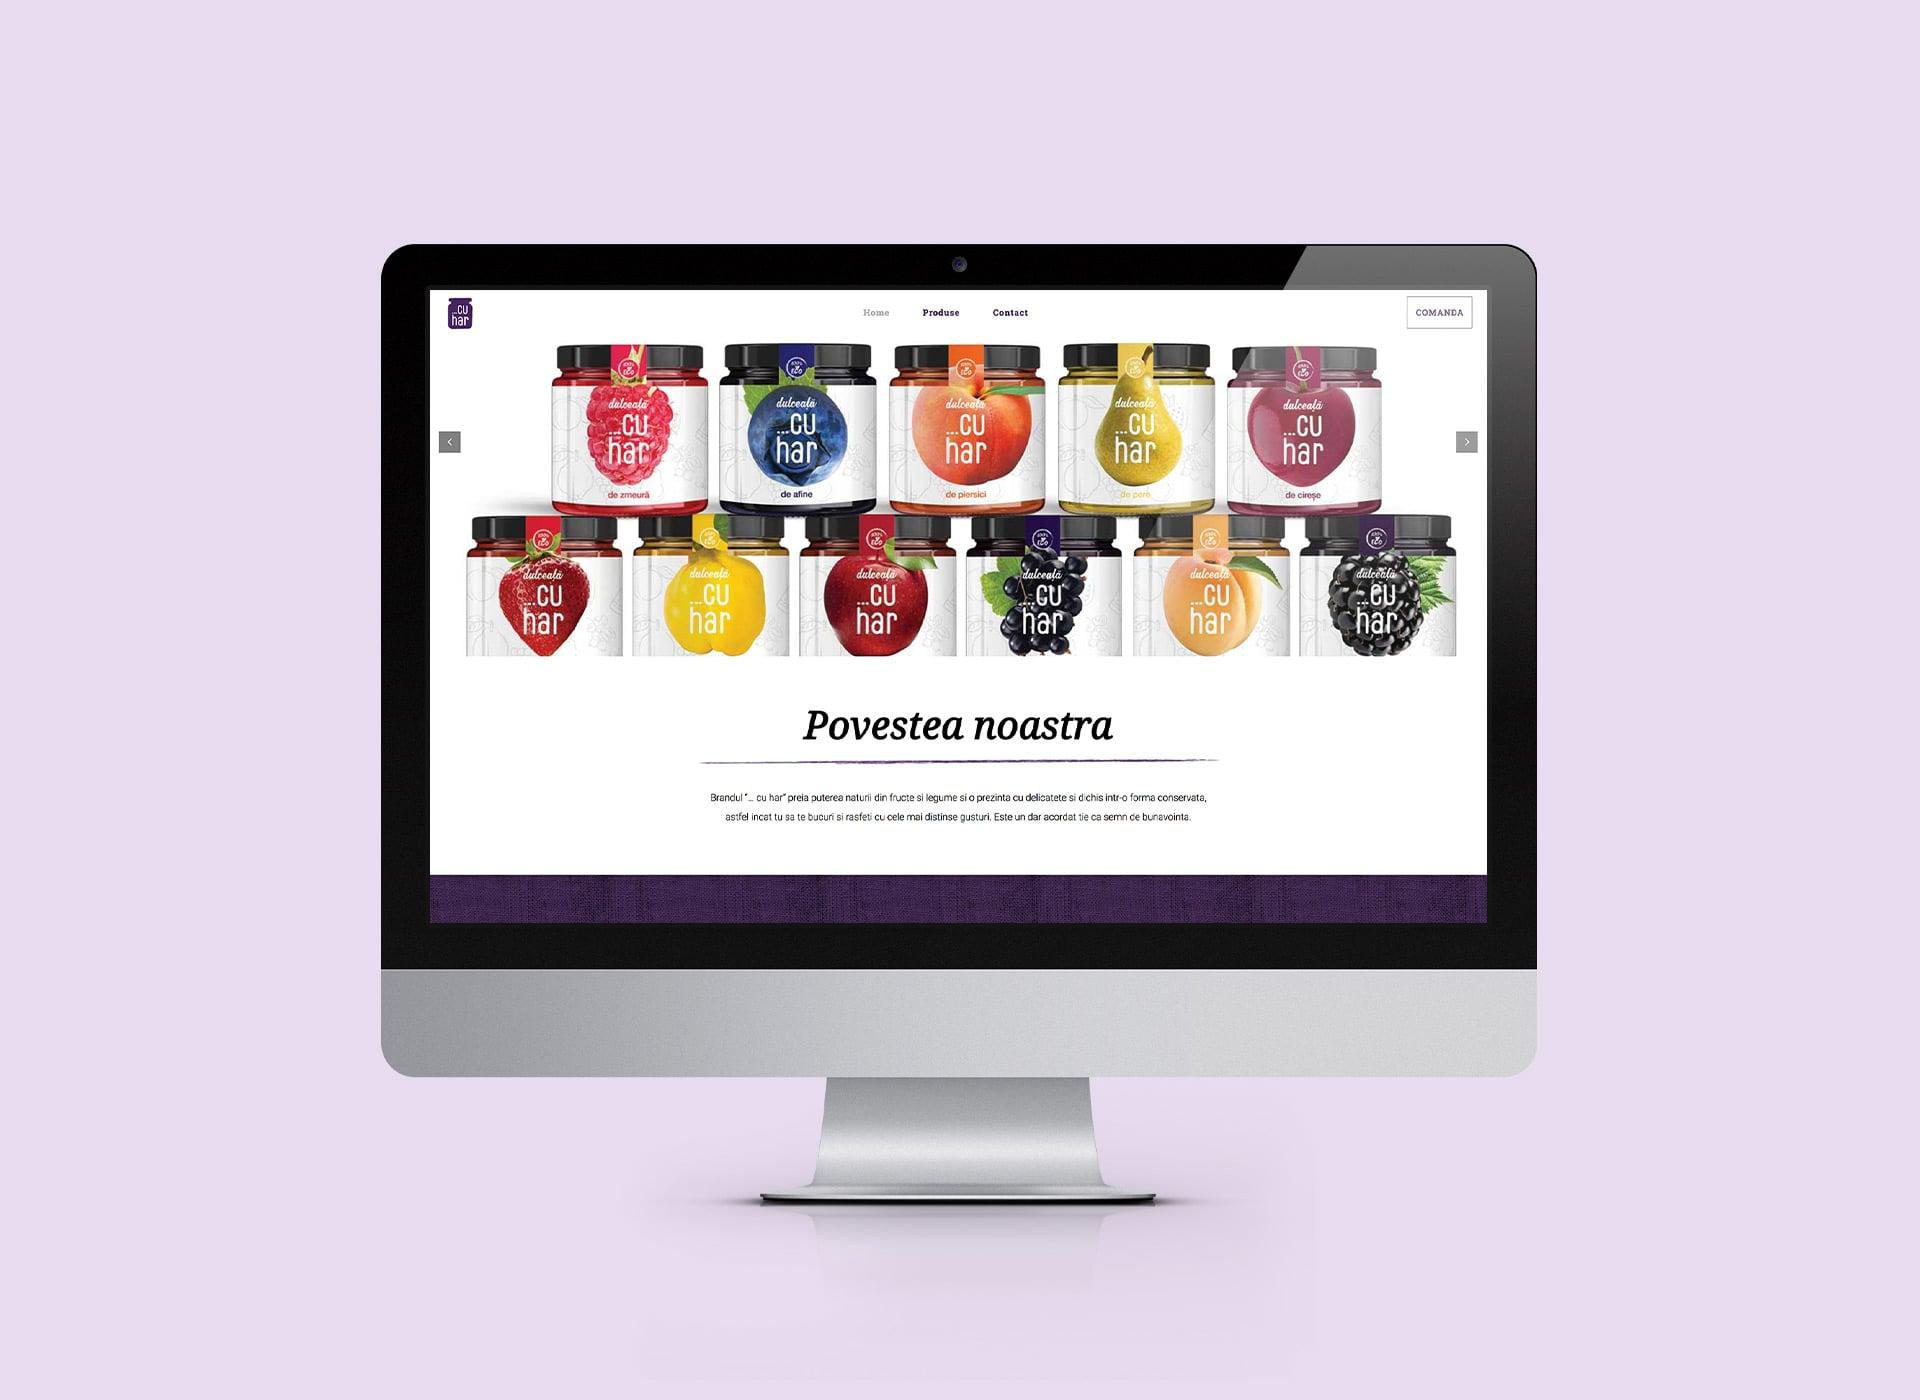 cuhar web branding by inoveo